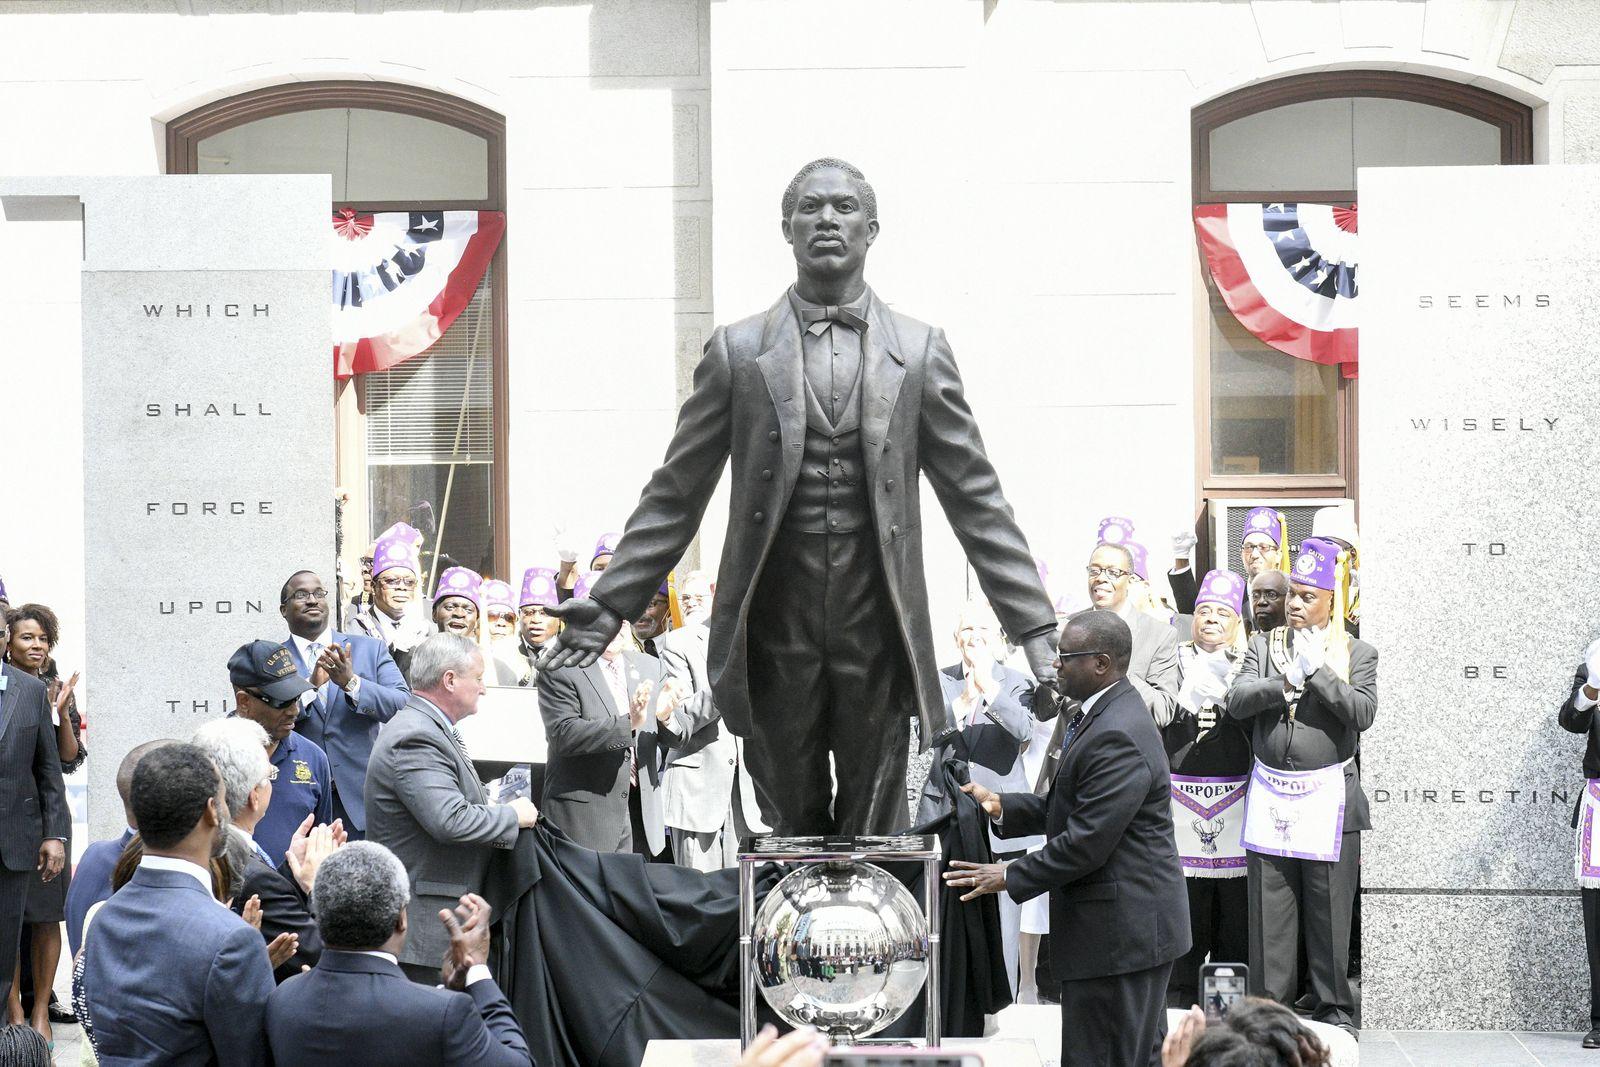 Bilder des Tages September 26 2017 Philadelphia Pennsylvania U S Philadelphia Mayor JIM KENN